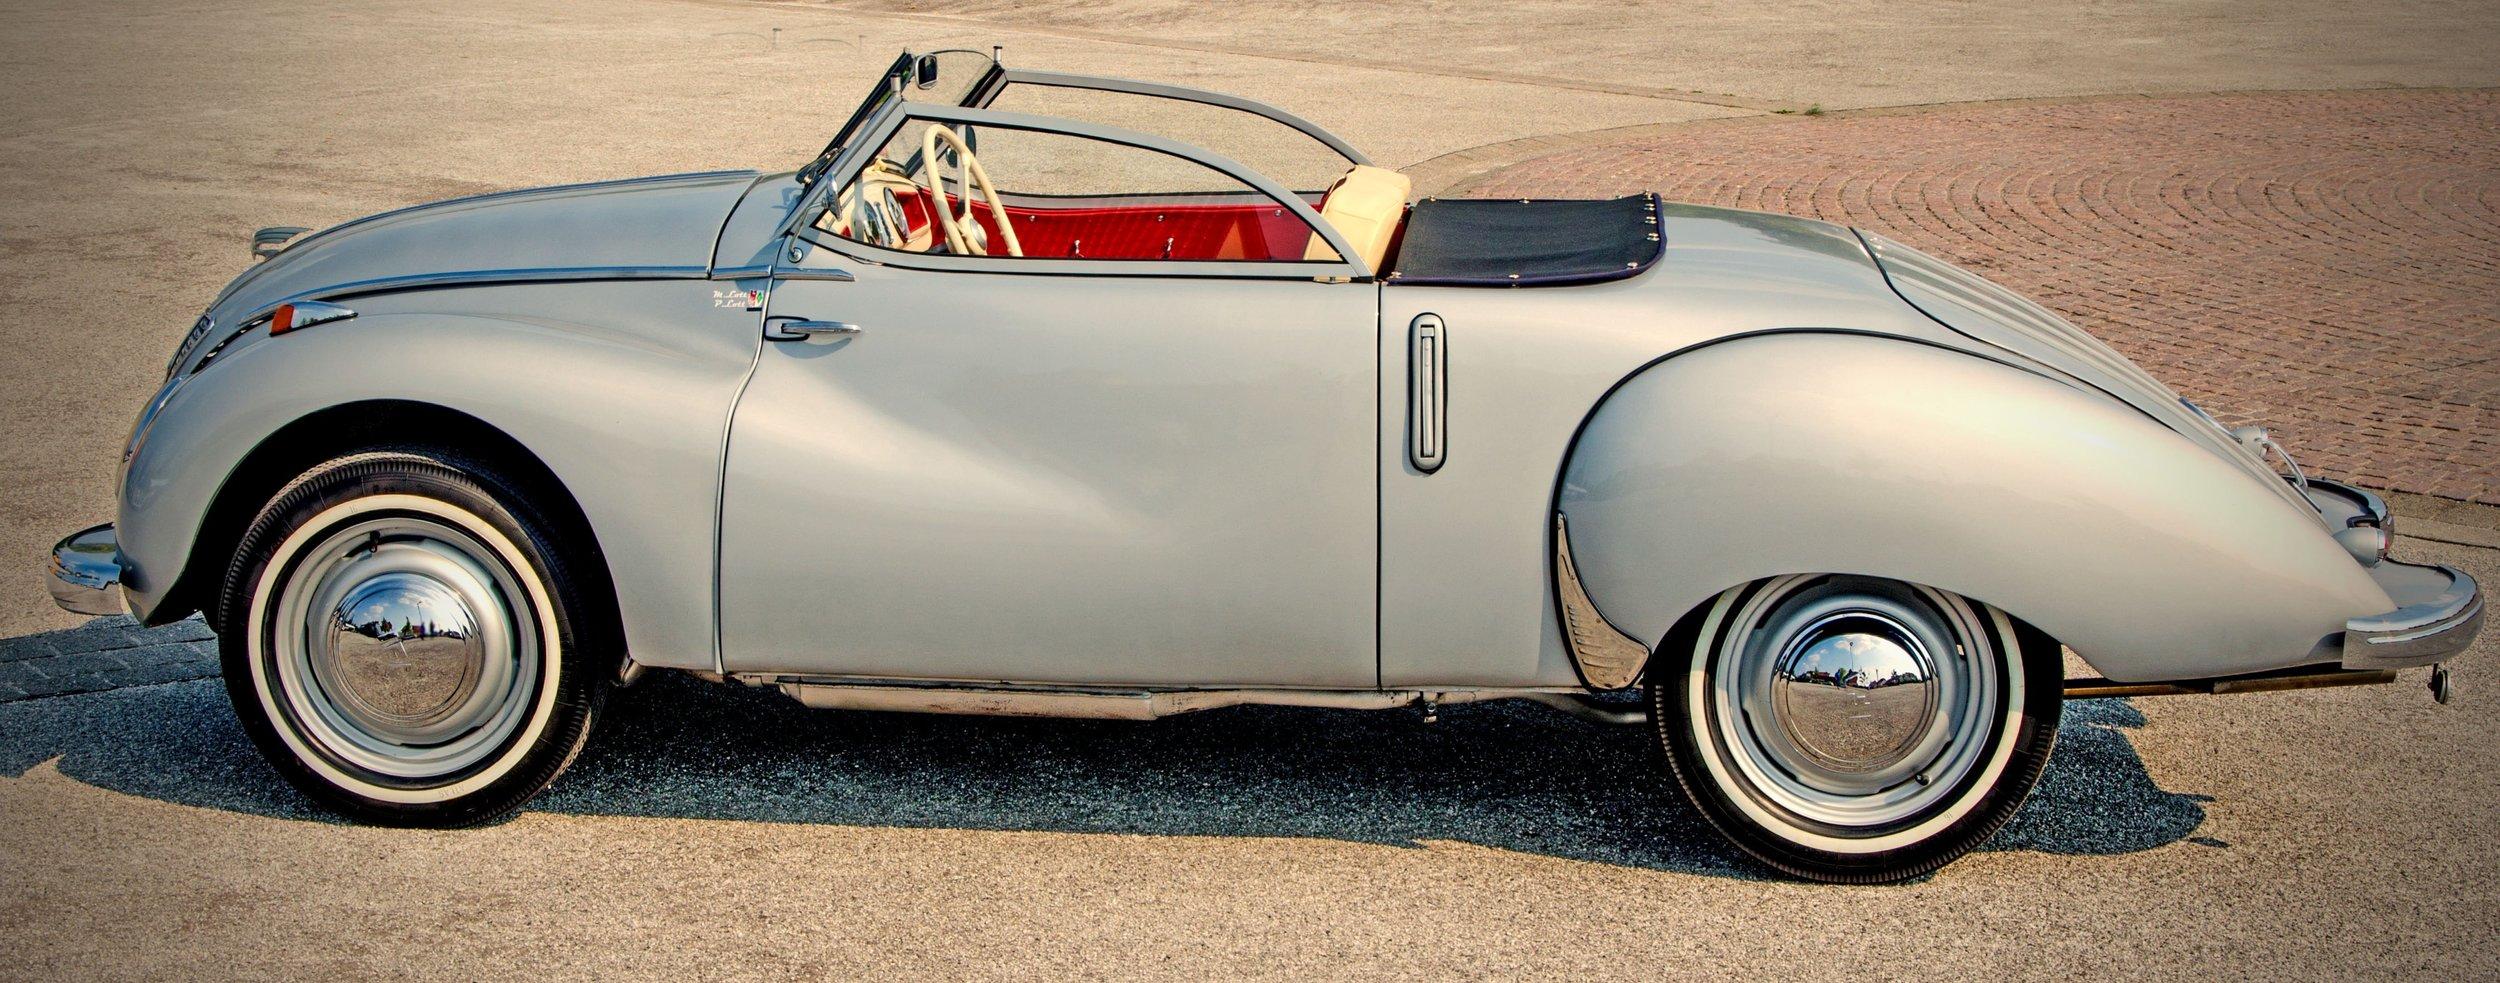 automotive-car-classic-185401.jpg